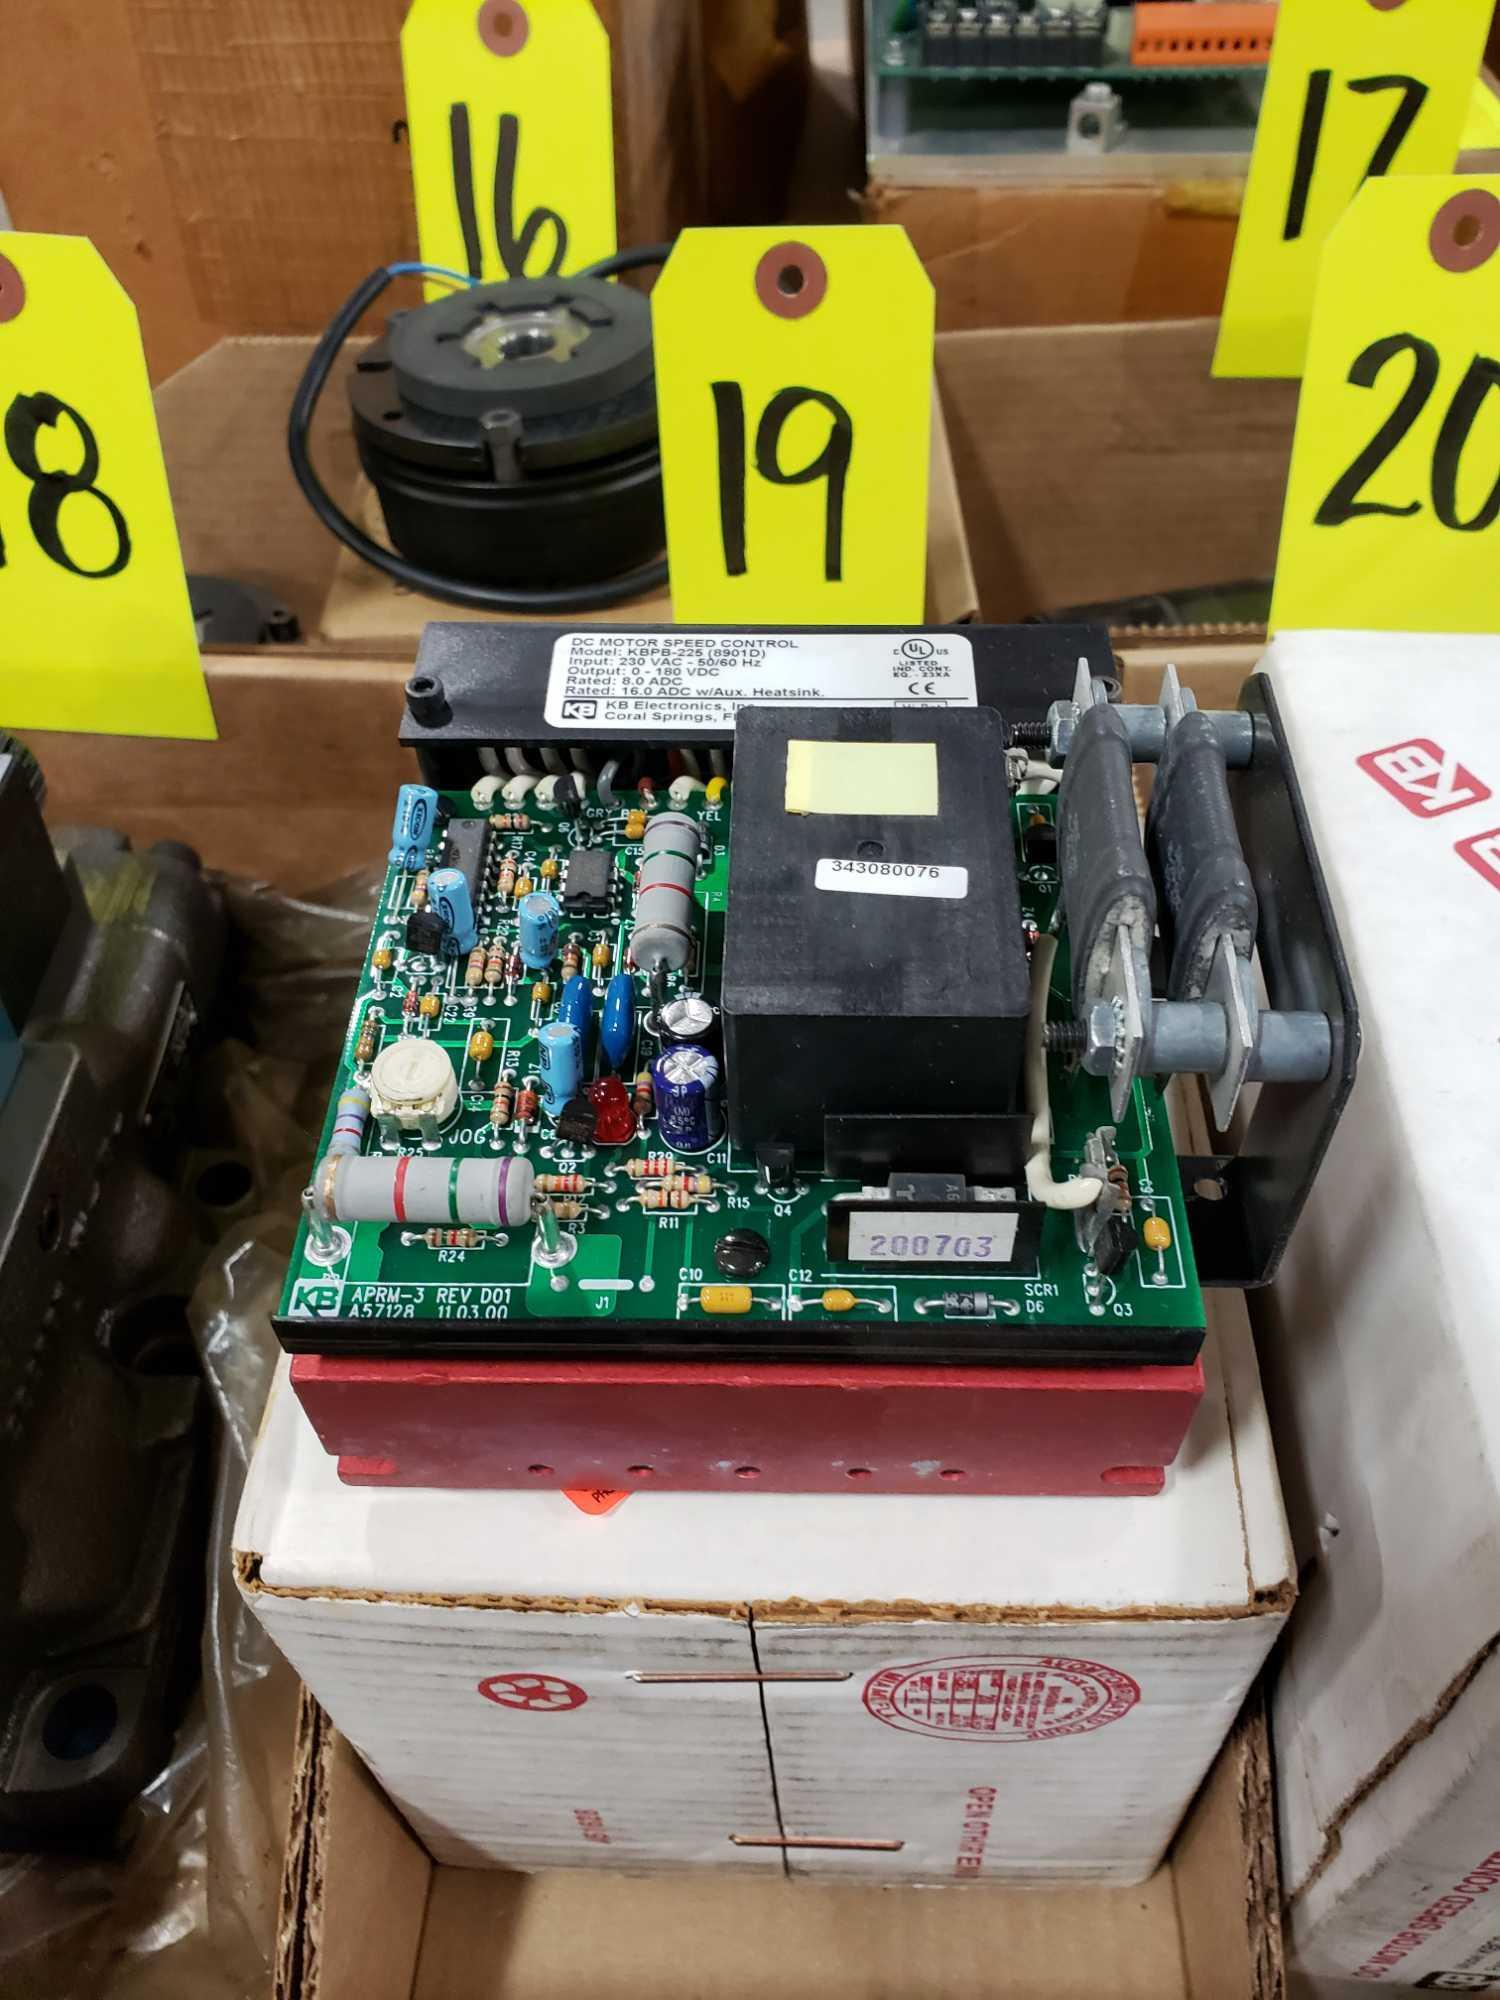 KB Penta Power reversing controld drive. Model KBPB-225, part 8901D. New in box.